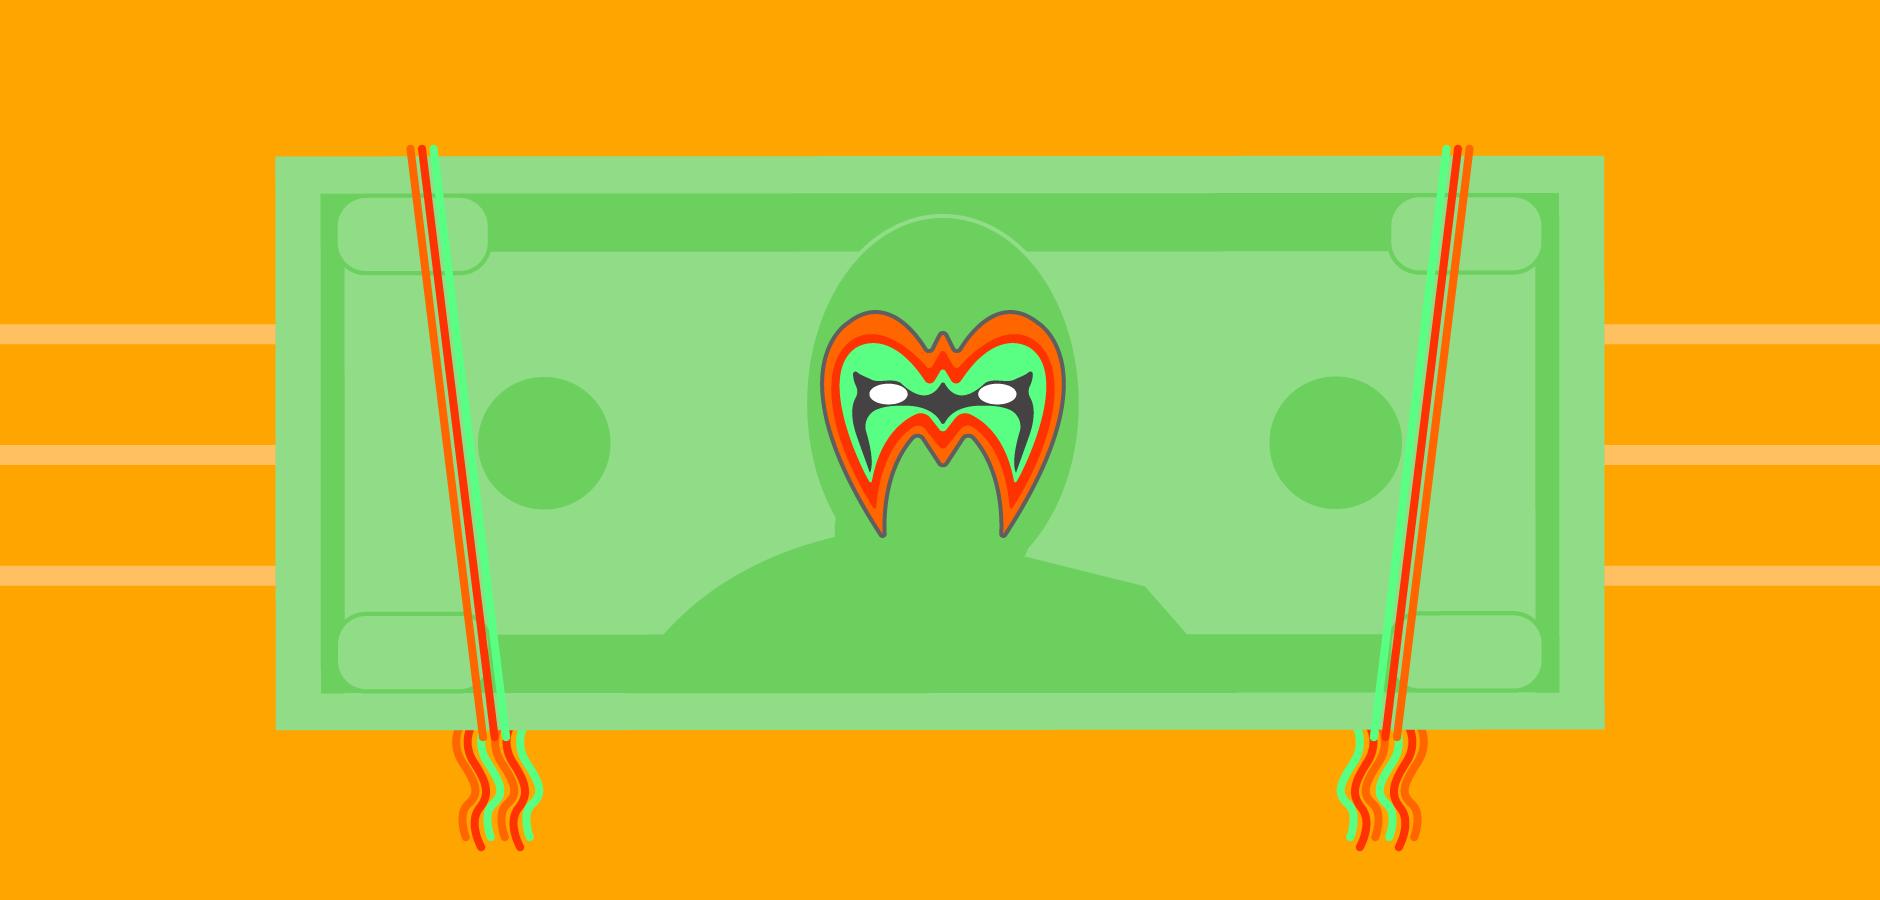 Cash clipart reimbursement. The ultimate based pt